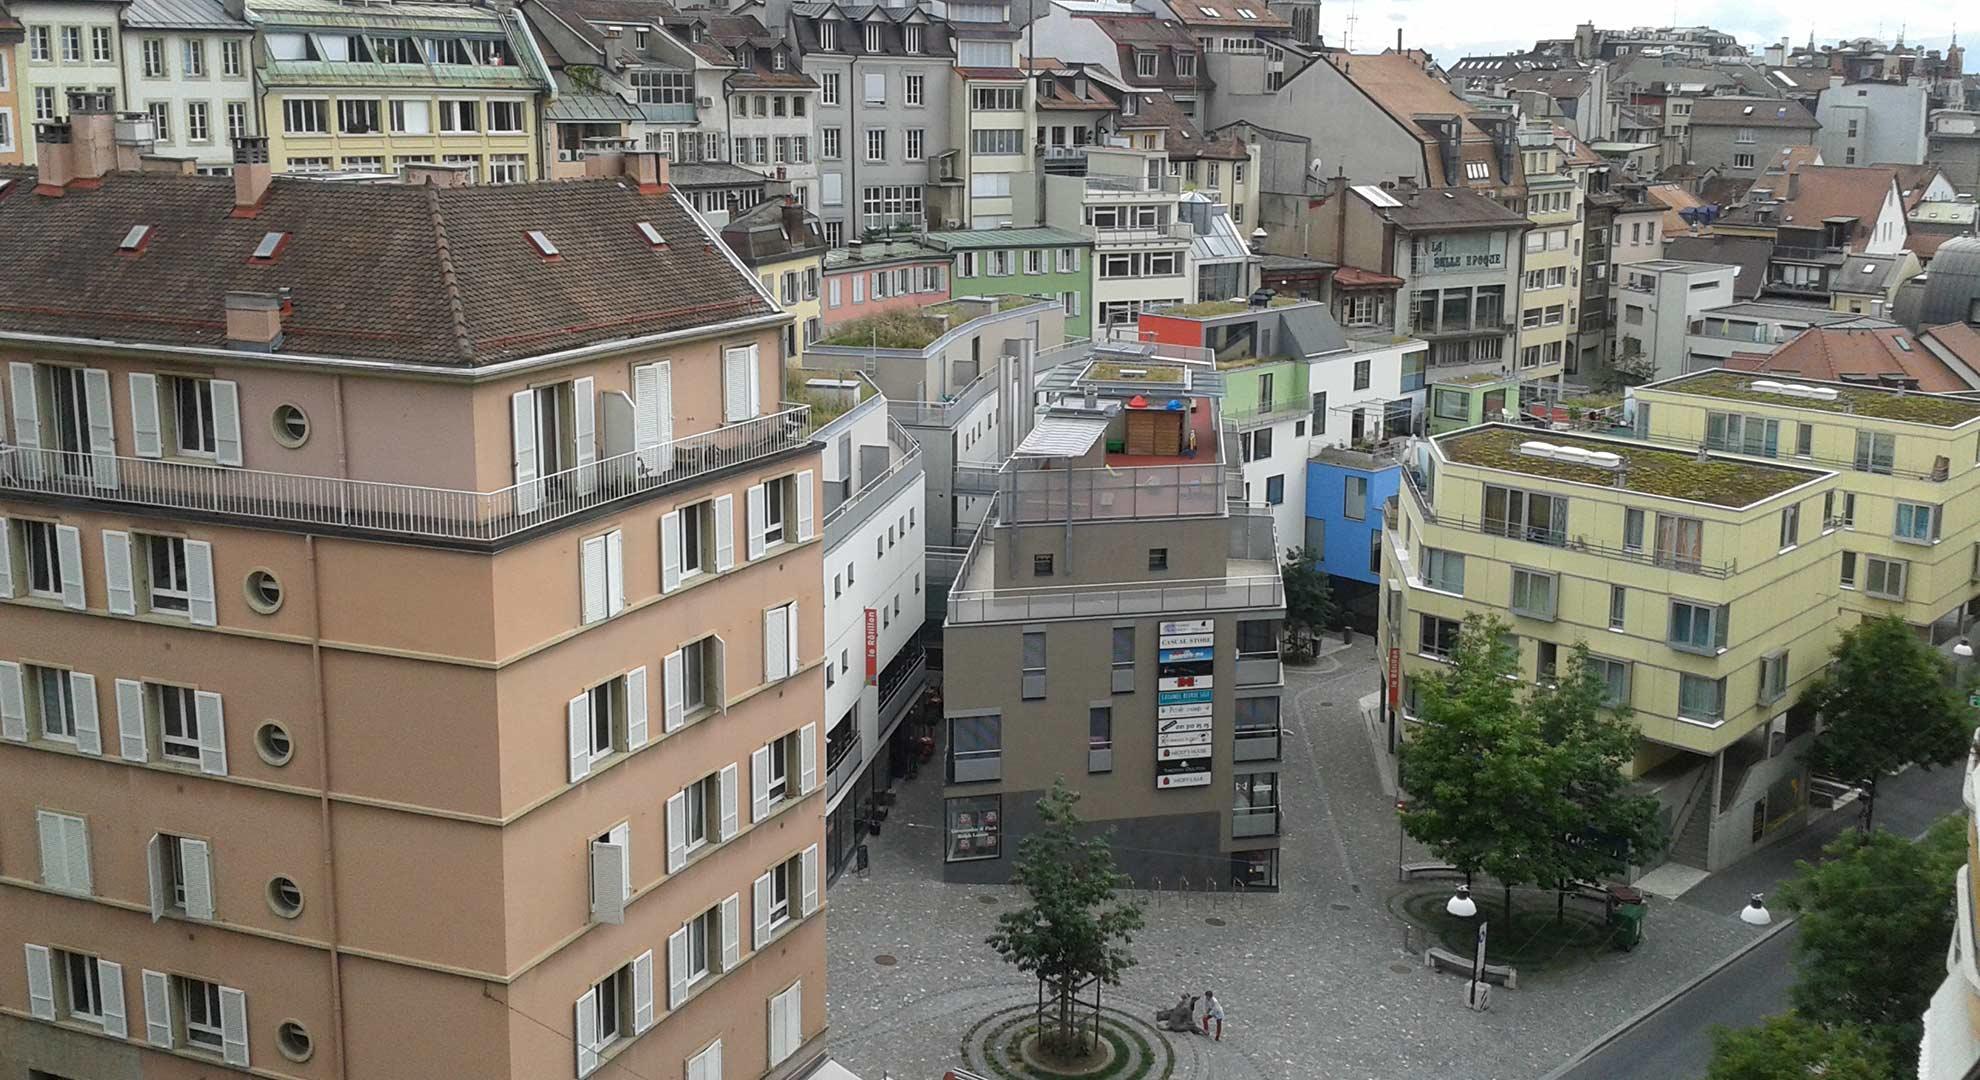 Diversity and urban mix, Lausanne, Switzerland